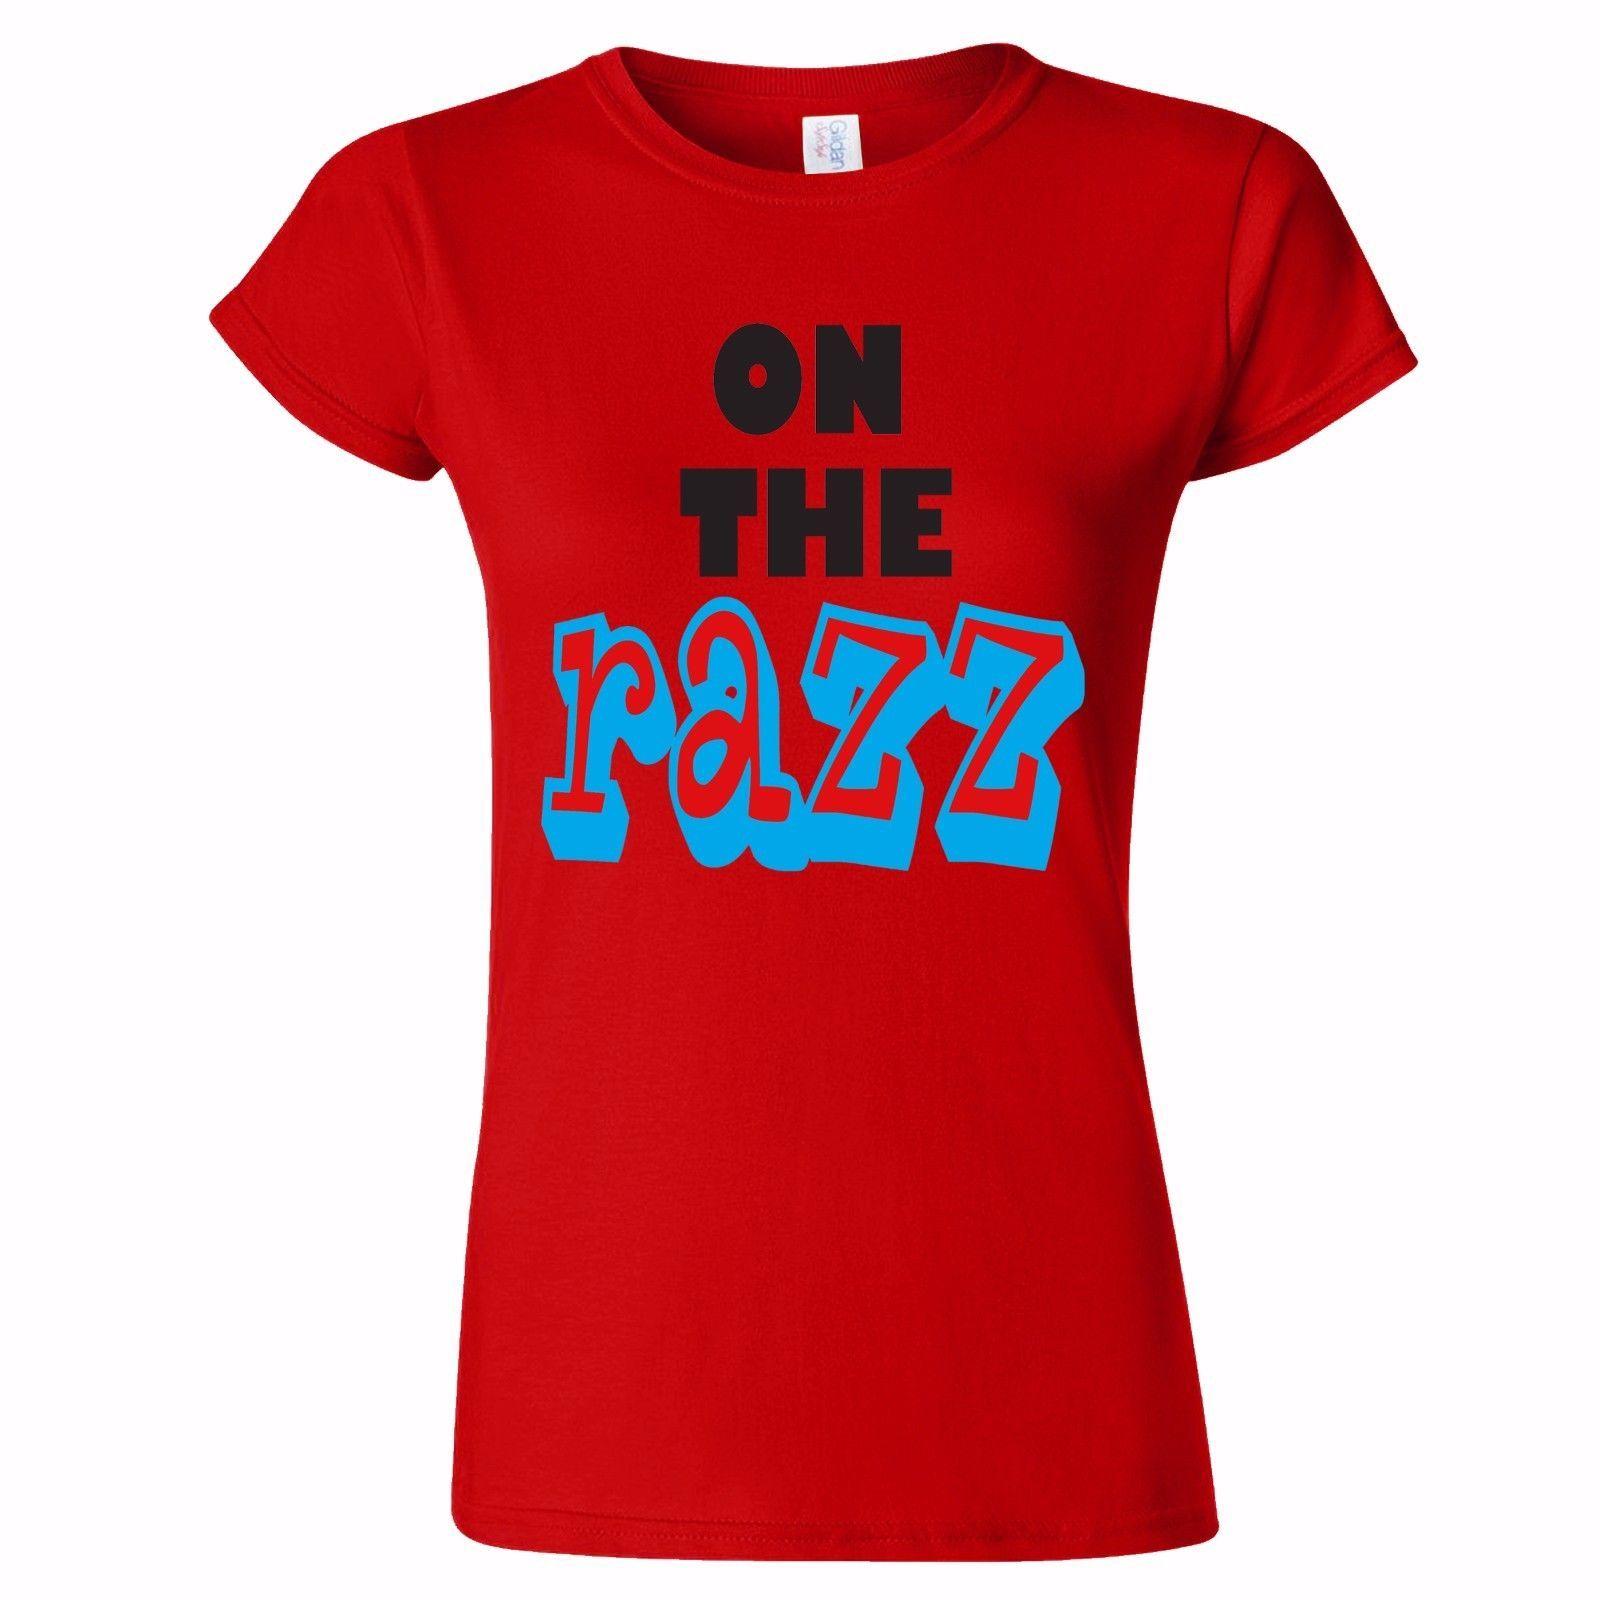 f8a127fab77 ON THE RAZZ WOMENS T SHIRT PARTY DRINKING XMAS CHRISTMAS CLUBBING CLUB PUB  HEN Shirts Print Funny T Shirt Prints From Bangtidyclothing